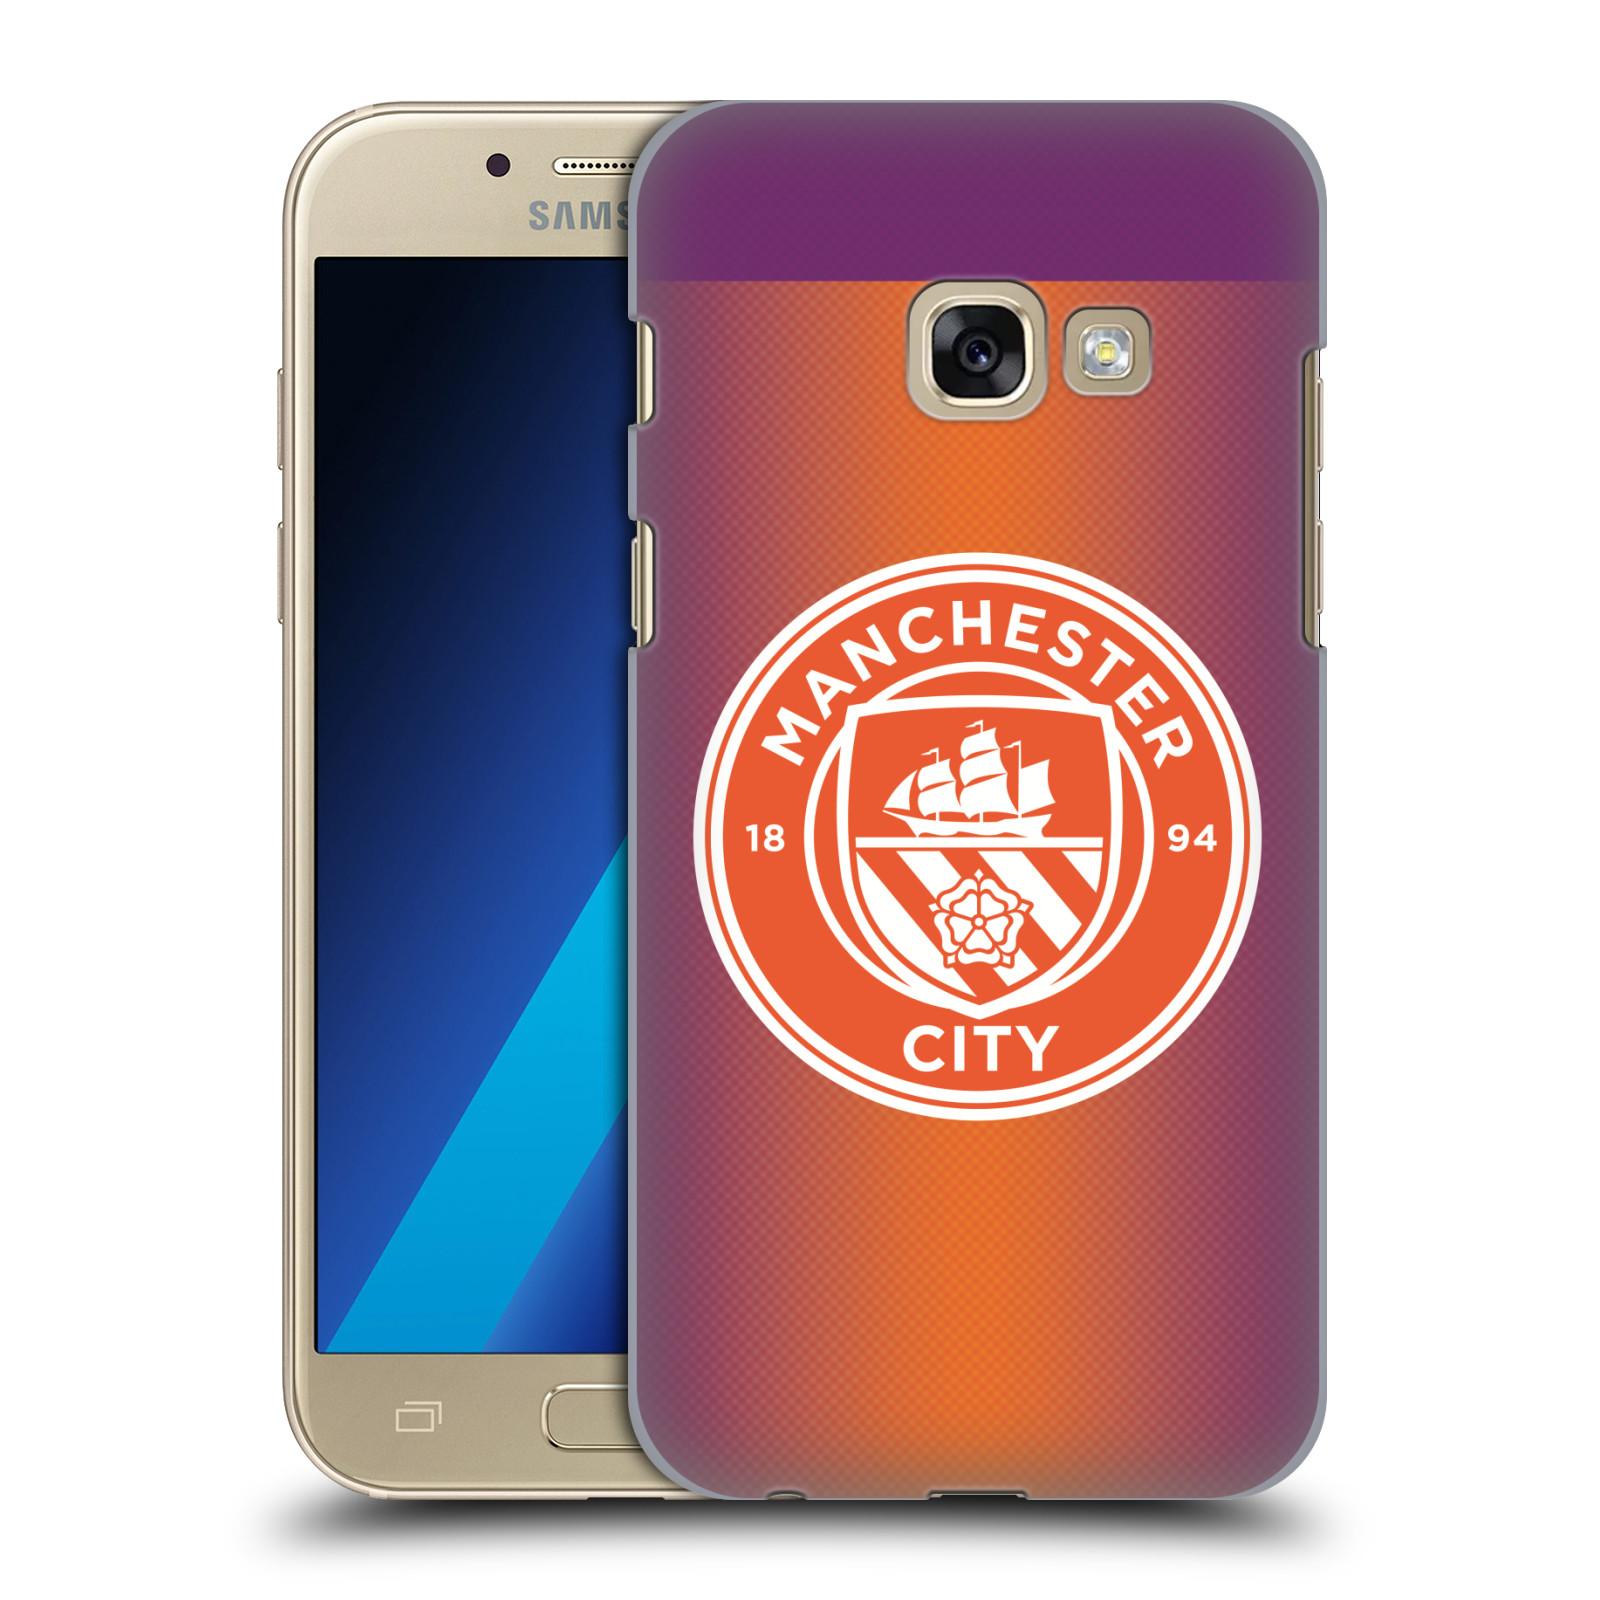 Plastové pouzdro na mobil Samsung Galaxy A3 (2017) HEAD CASE Manchester City FC - Oranžové nové logo